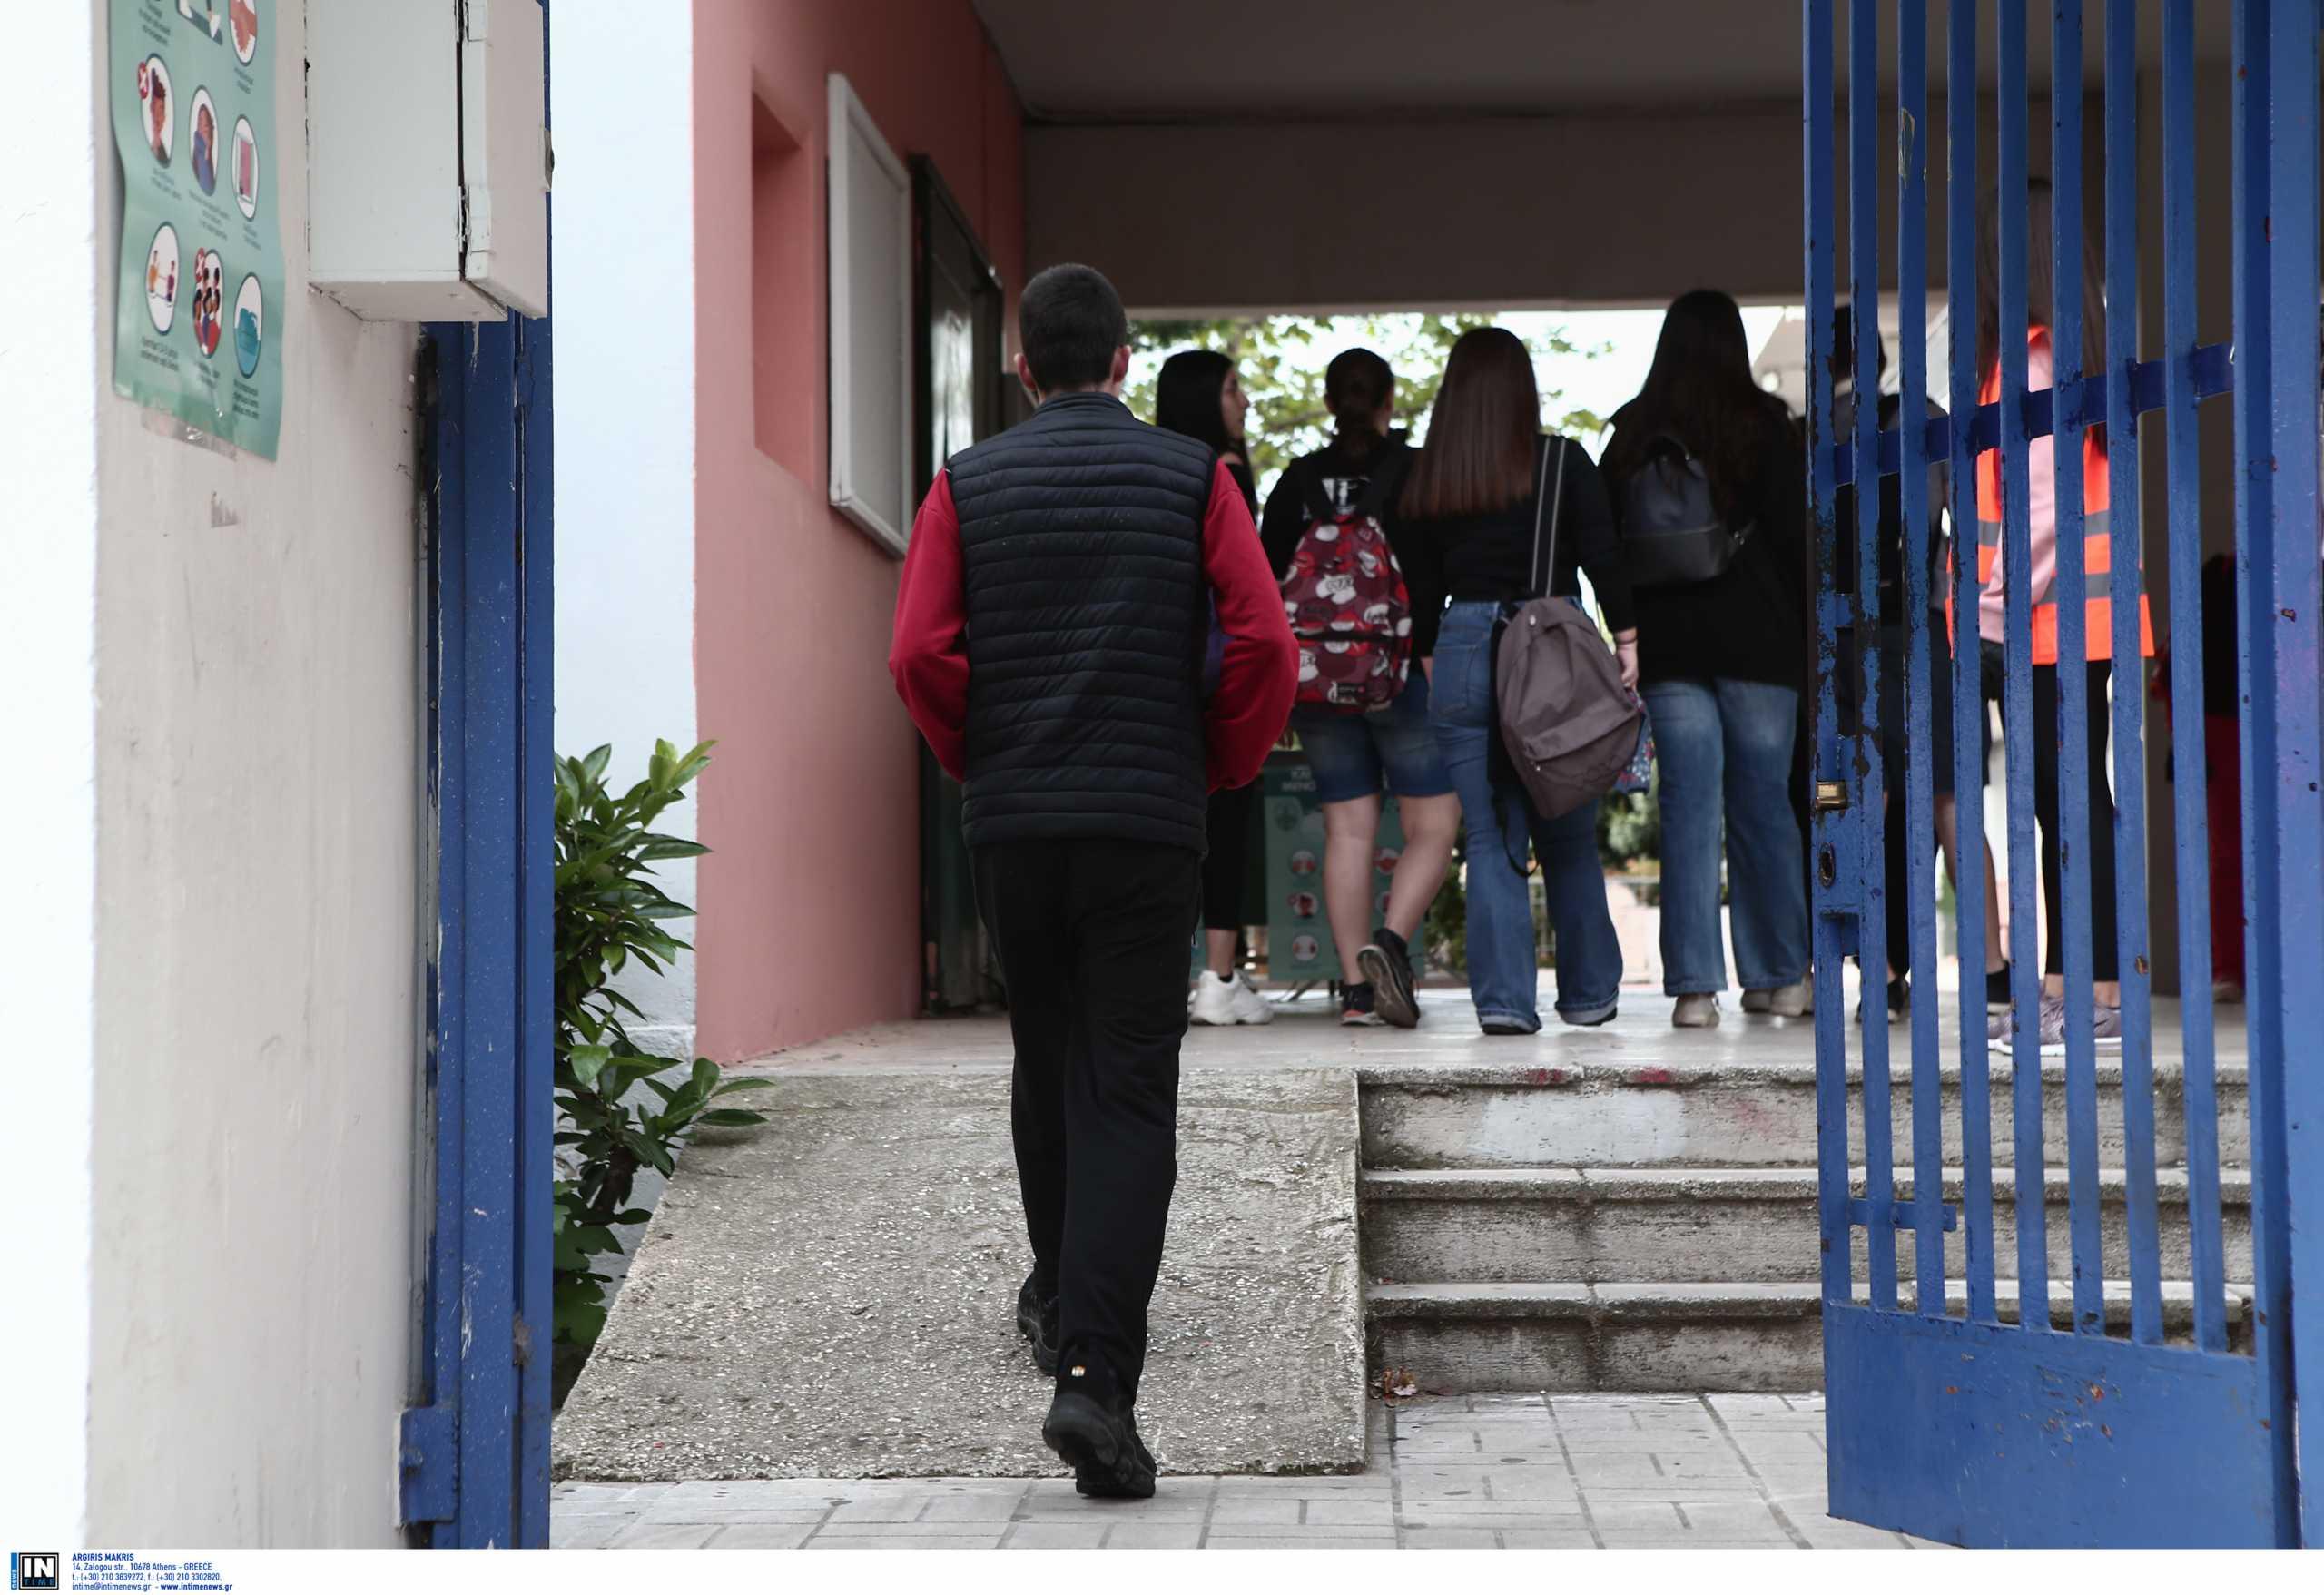 gov.gr self test – σχολεία: Επιστροφή στα θρανία με τεστ και μάσκες – Όλα τα μέτρα